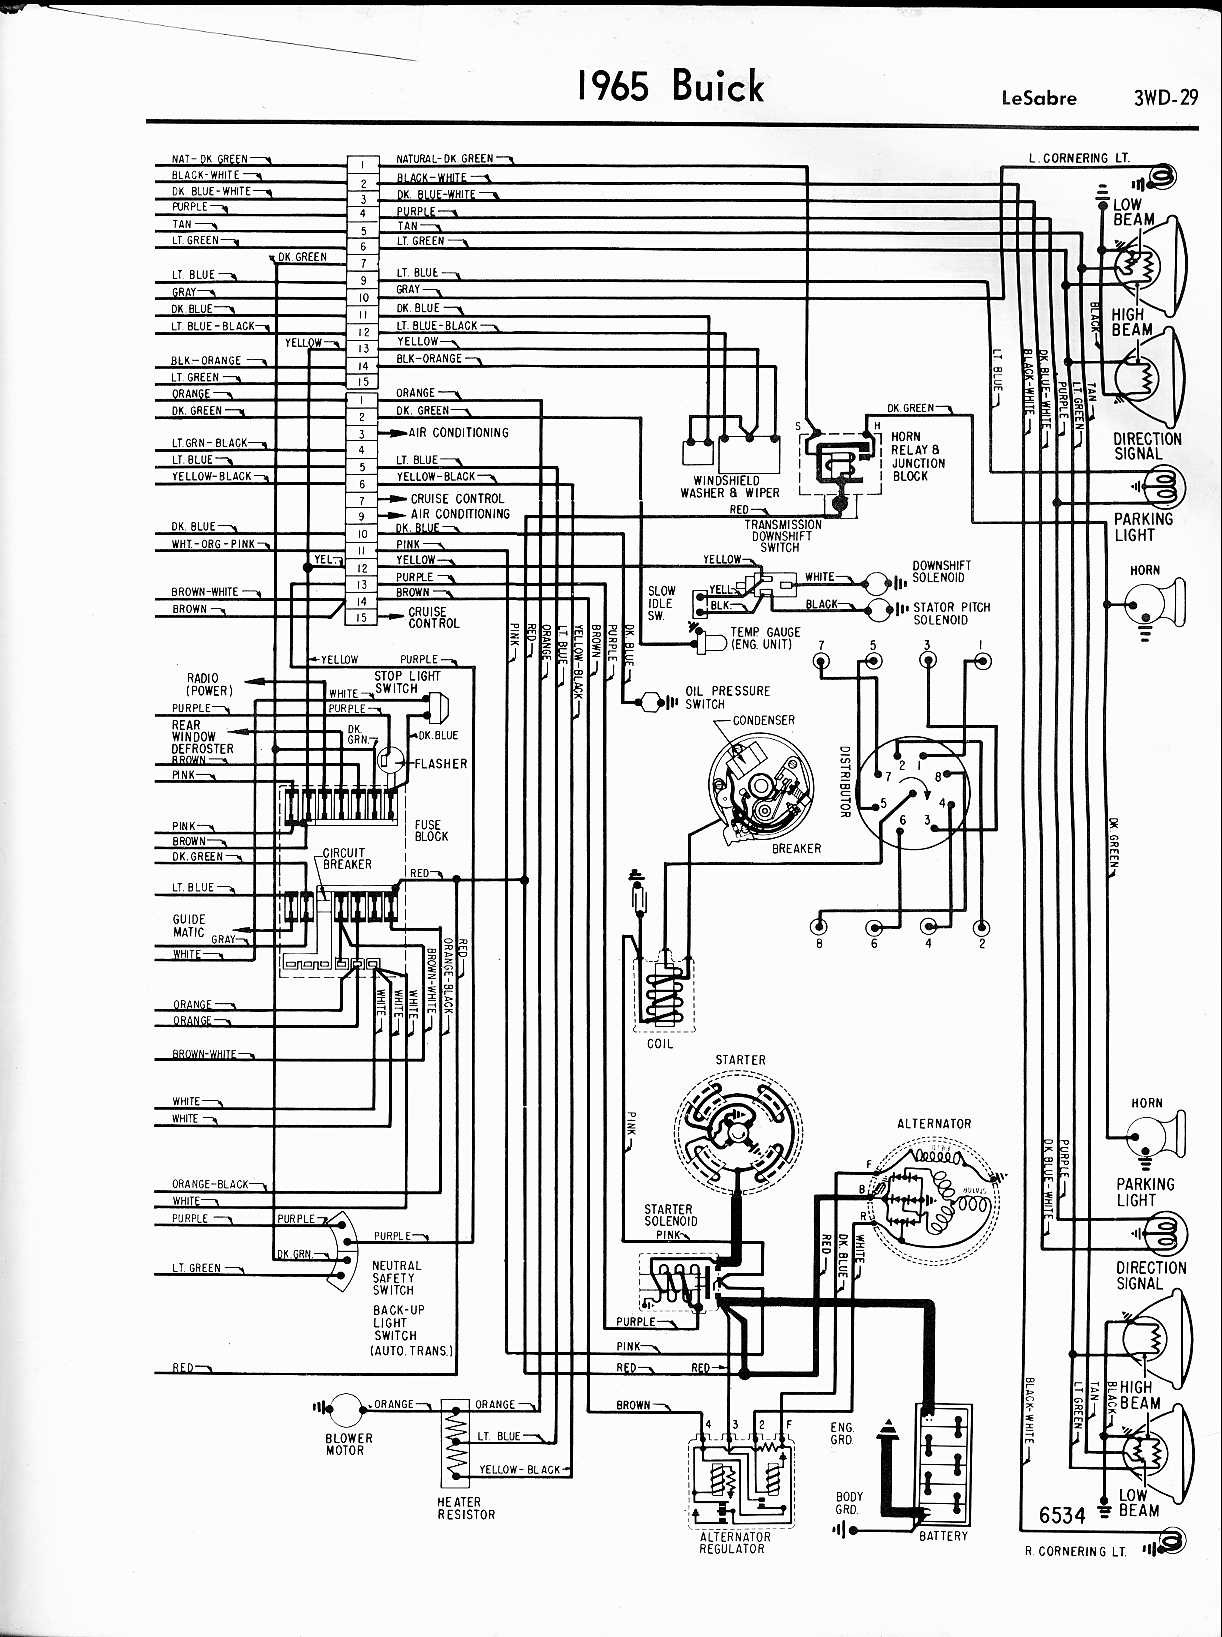 Car Heater Blower Motor Wiring Diagram Blower Motor Wiring Diagram for 96 ford Ranger Furthermore ford Of Car Heater Blower Motor Wiring Diagram